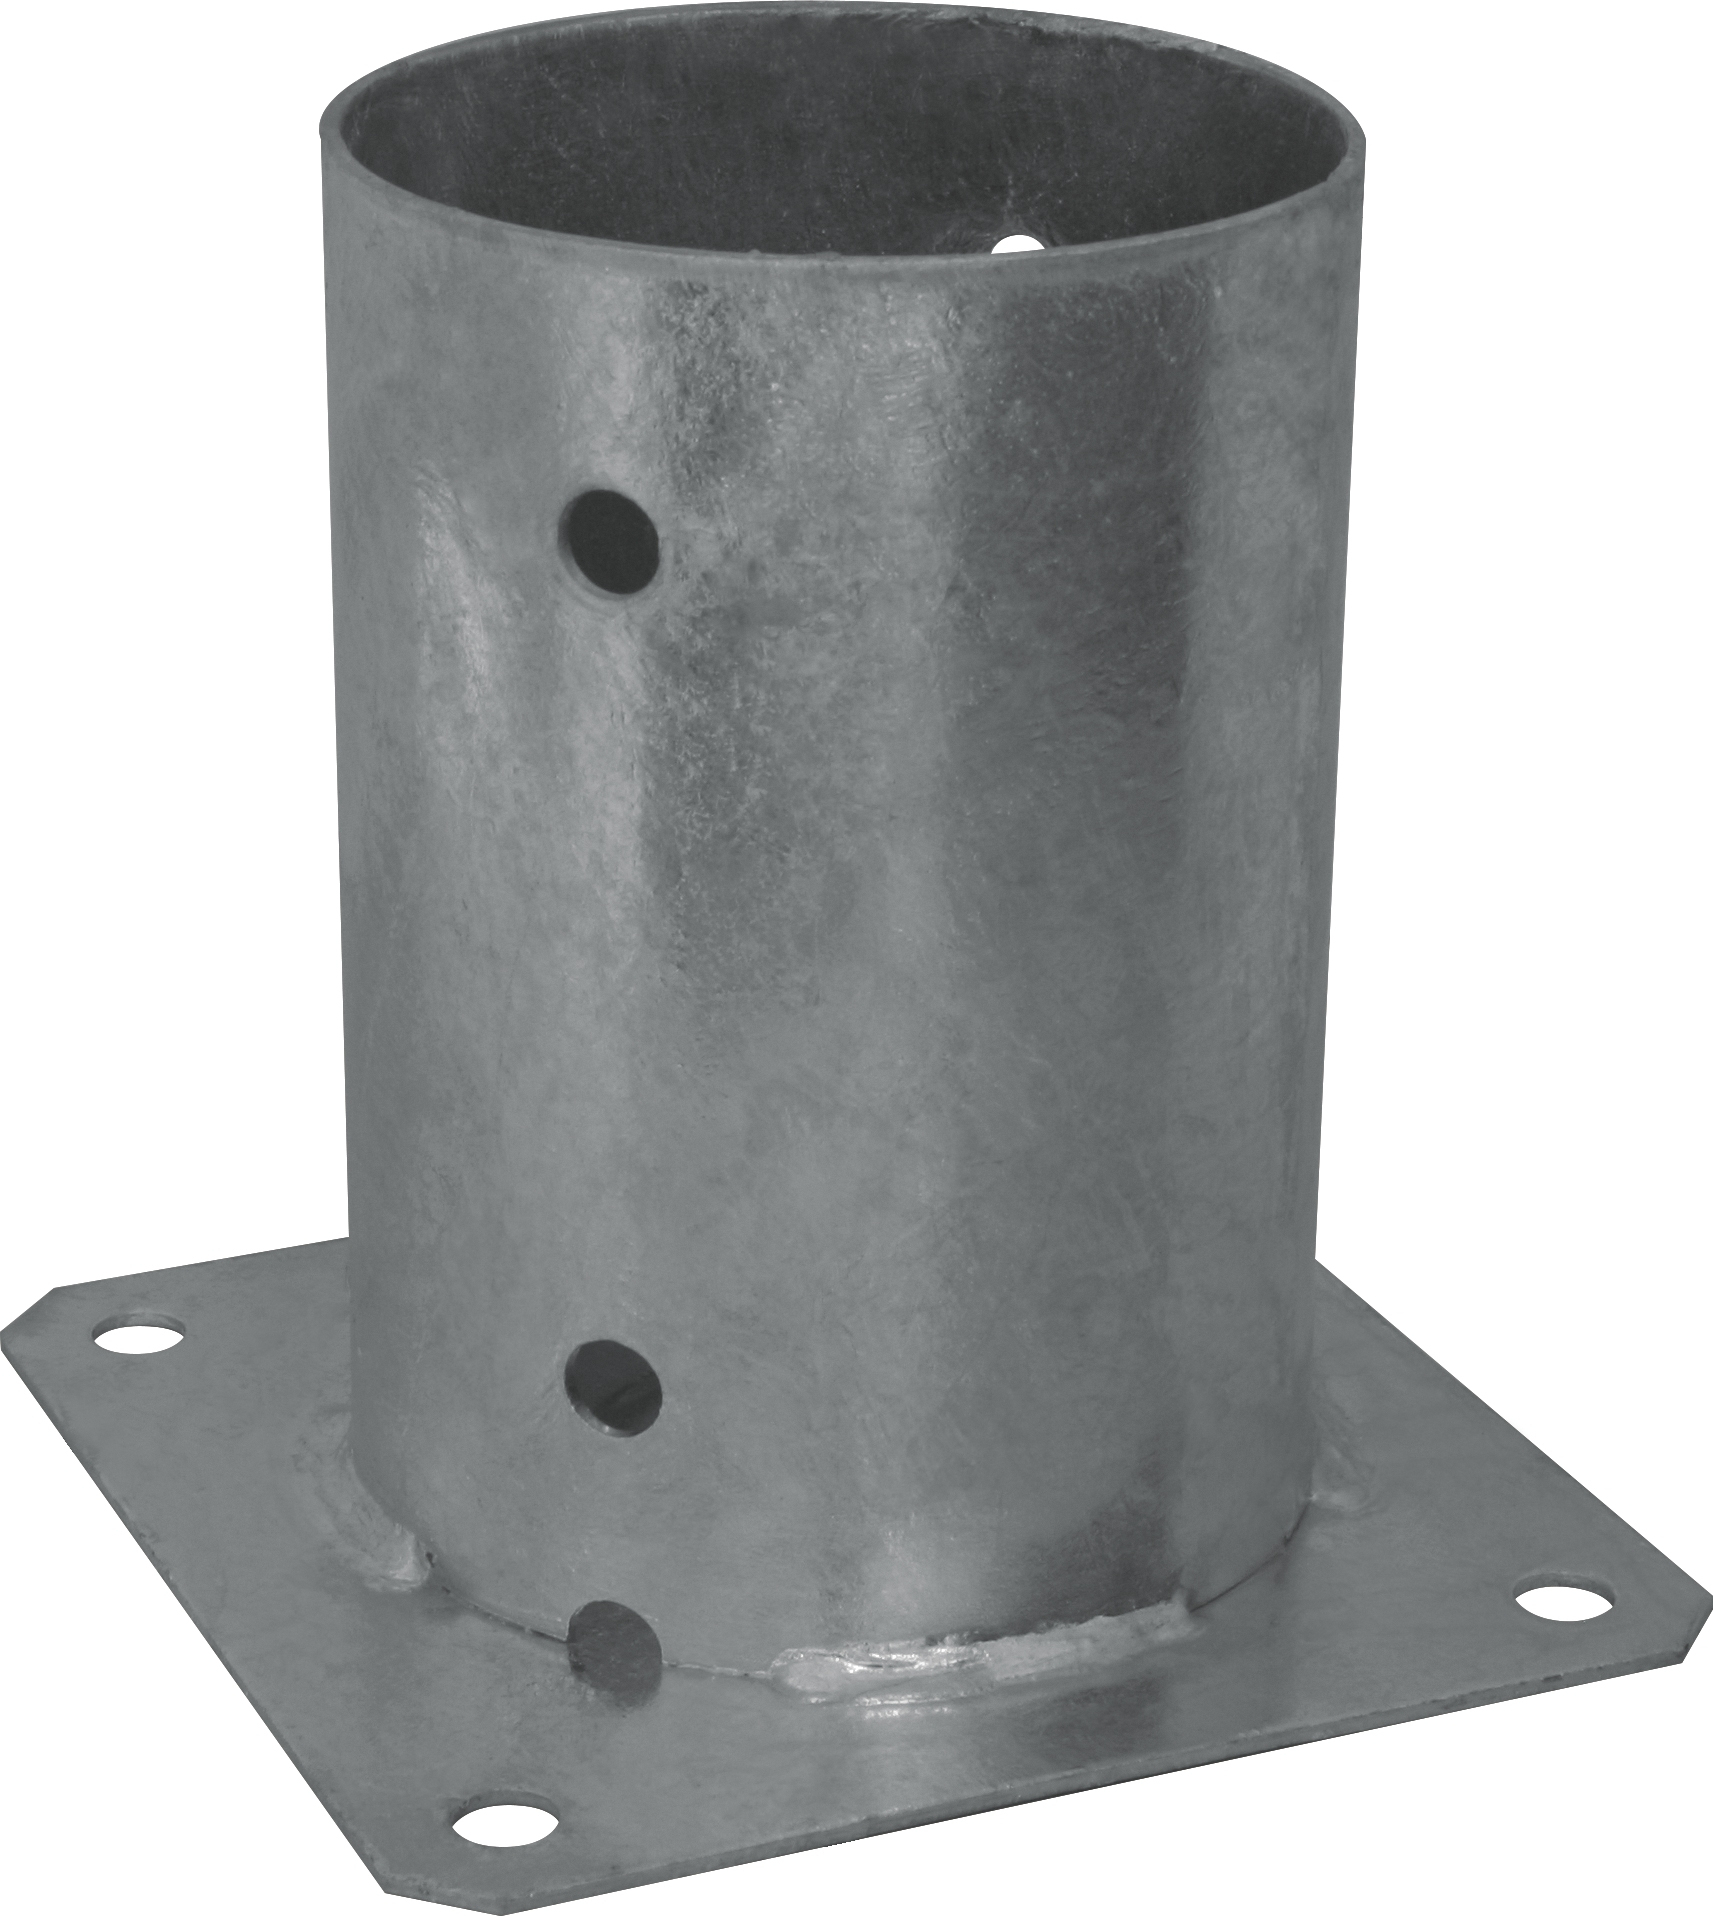 STAFFA BASE TONDA CM   80 X 150 H 150